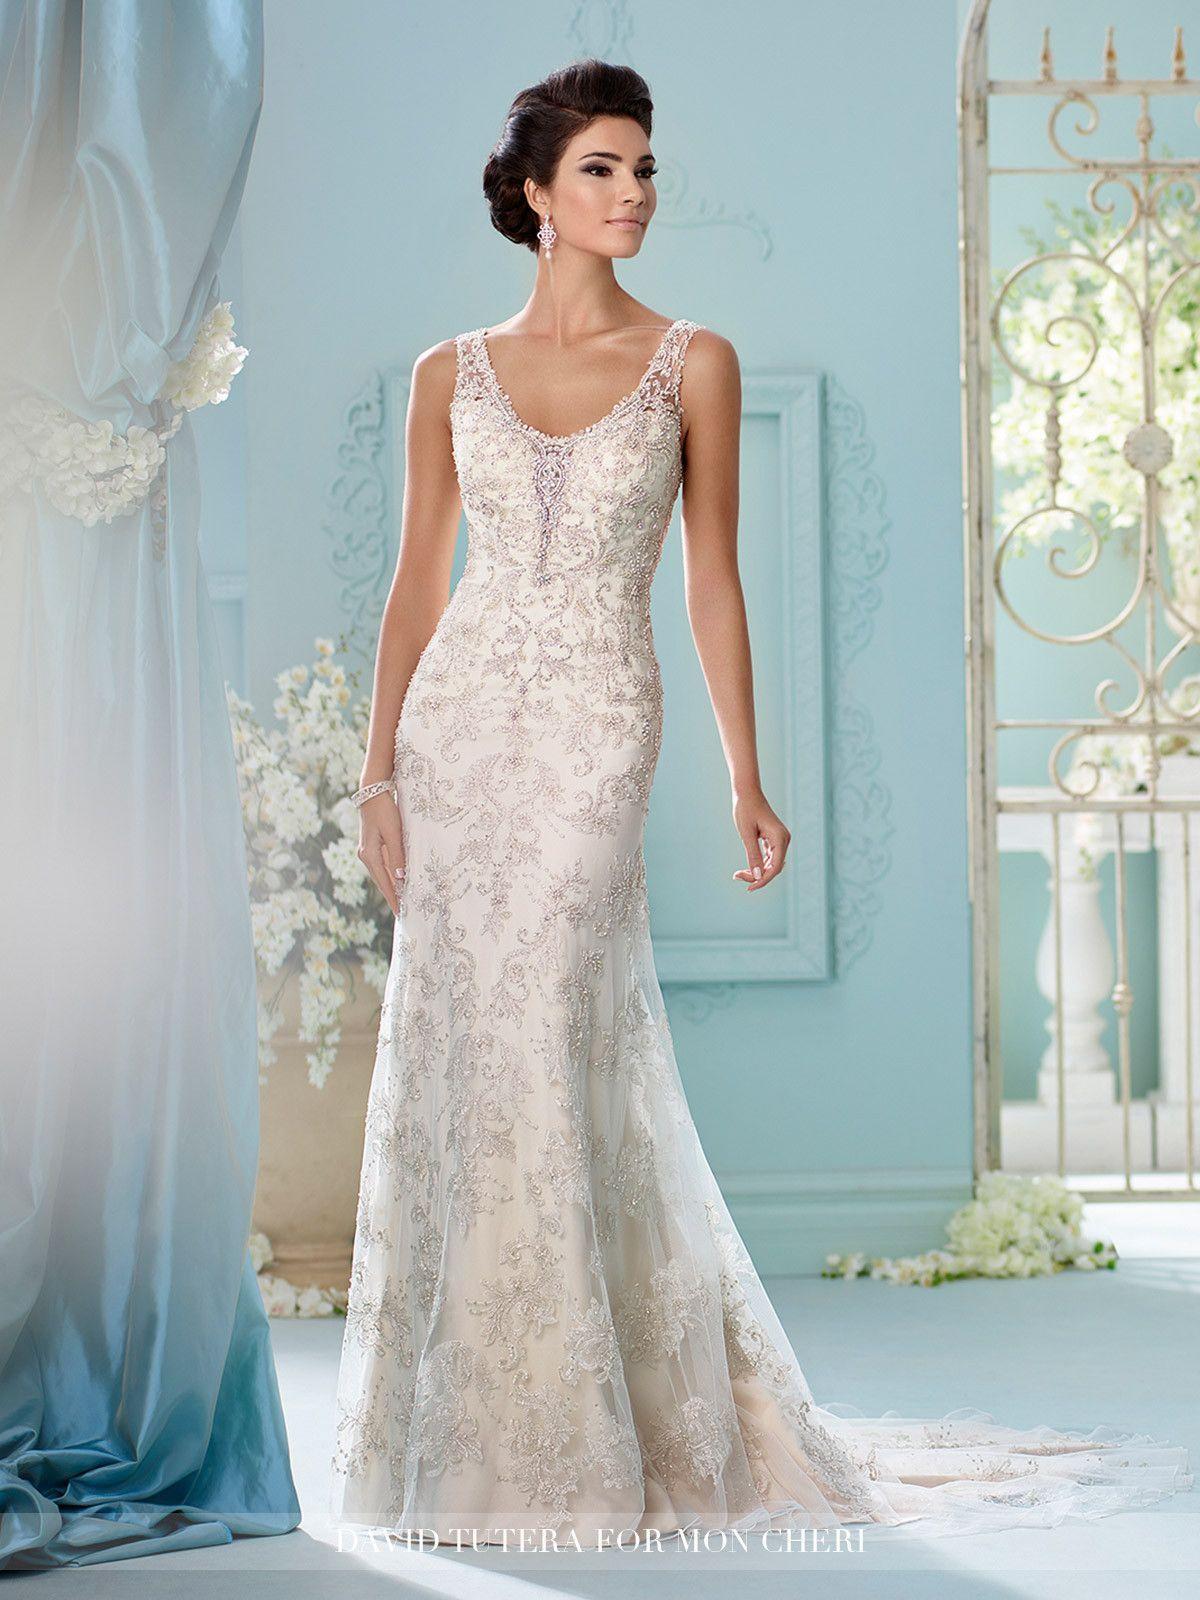 Outstanding Lazaro Blush Wedding Dress Sketch - All Wedding Dresses ...